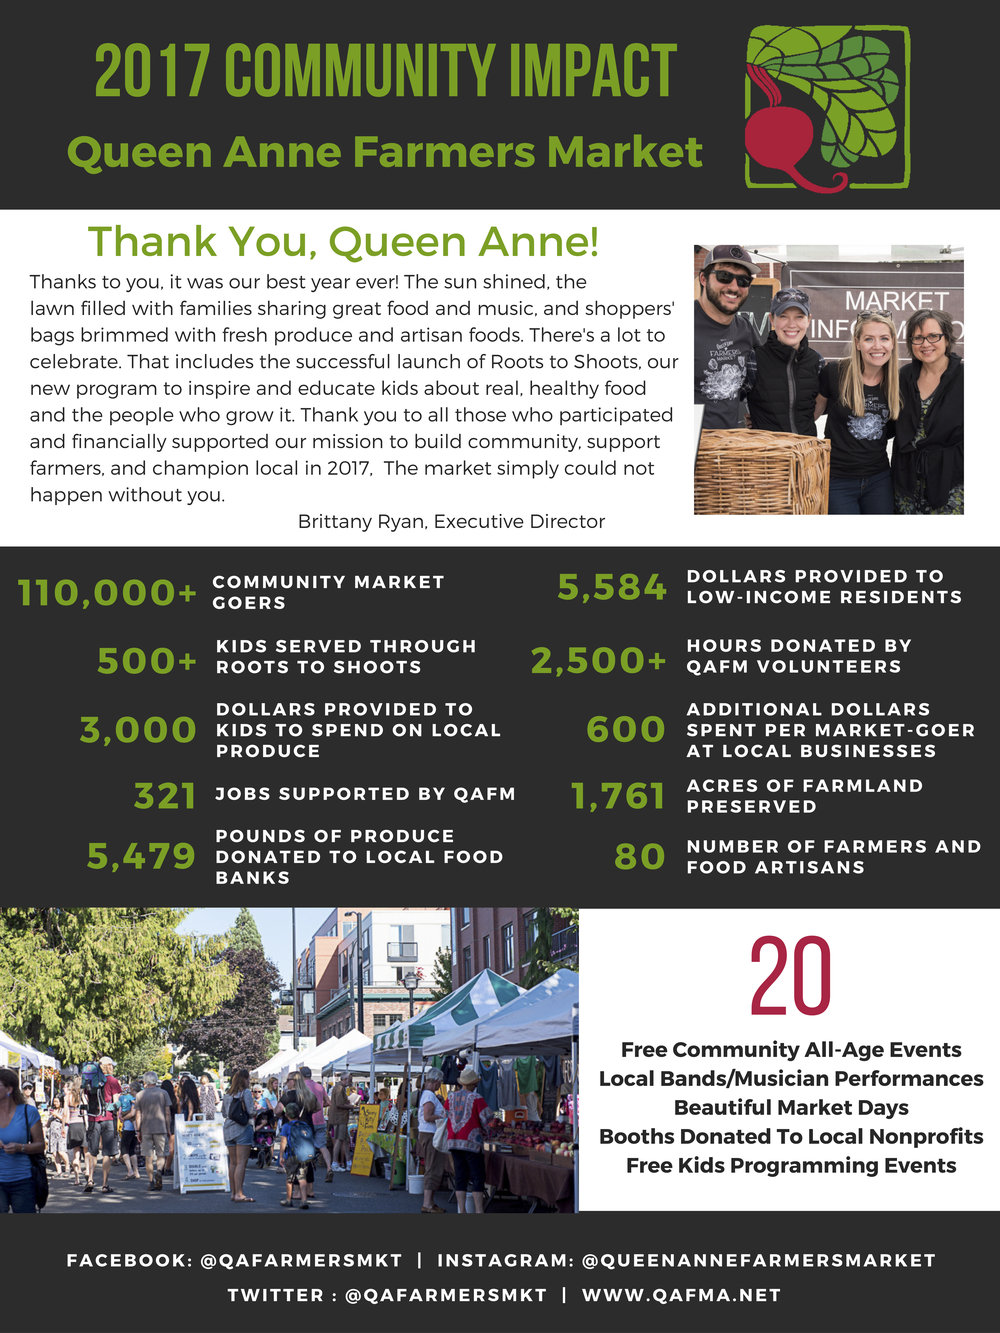 2017 QAFM Community Impact.jpg